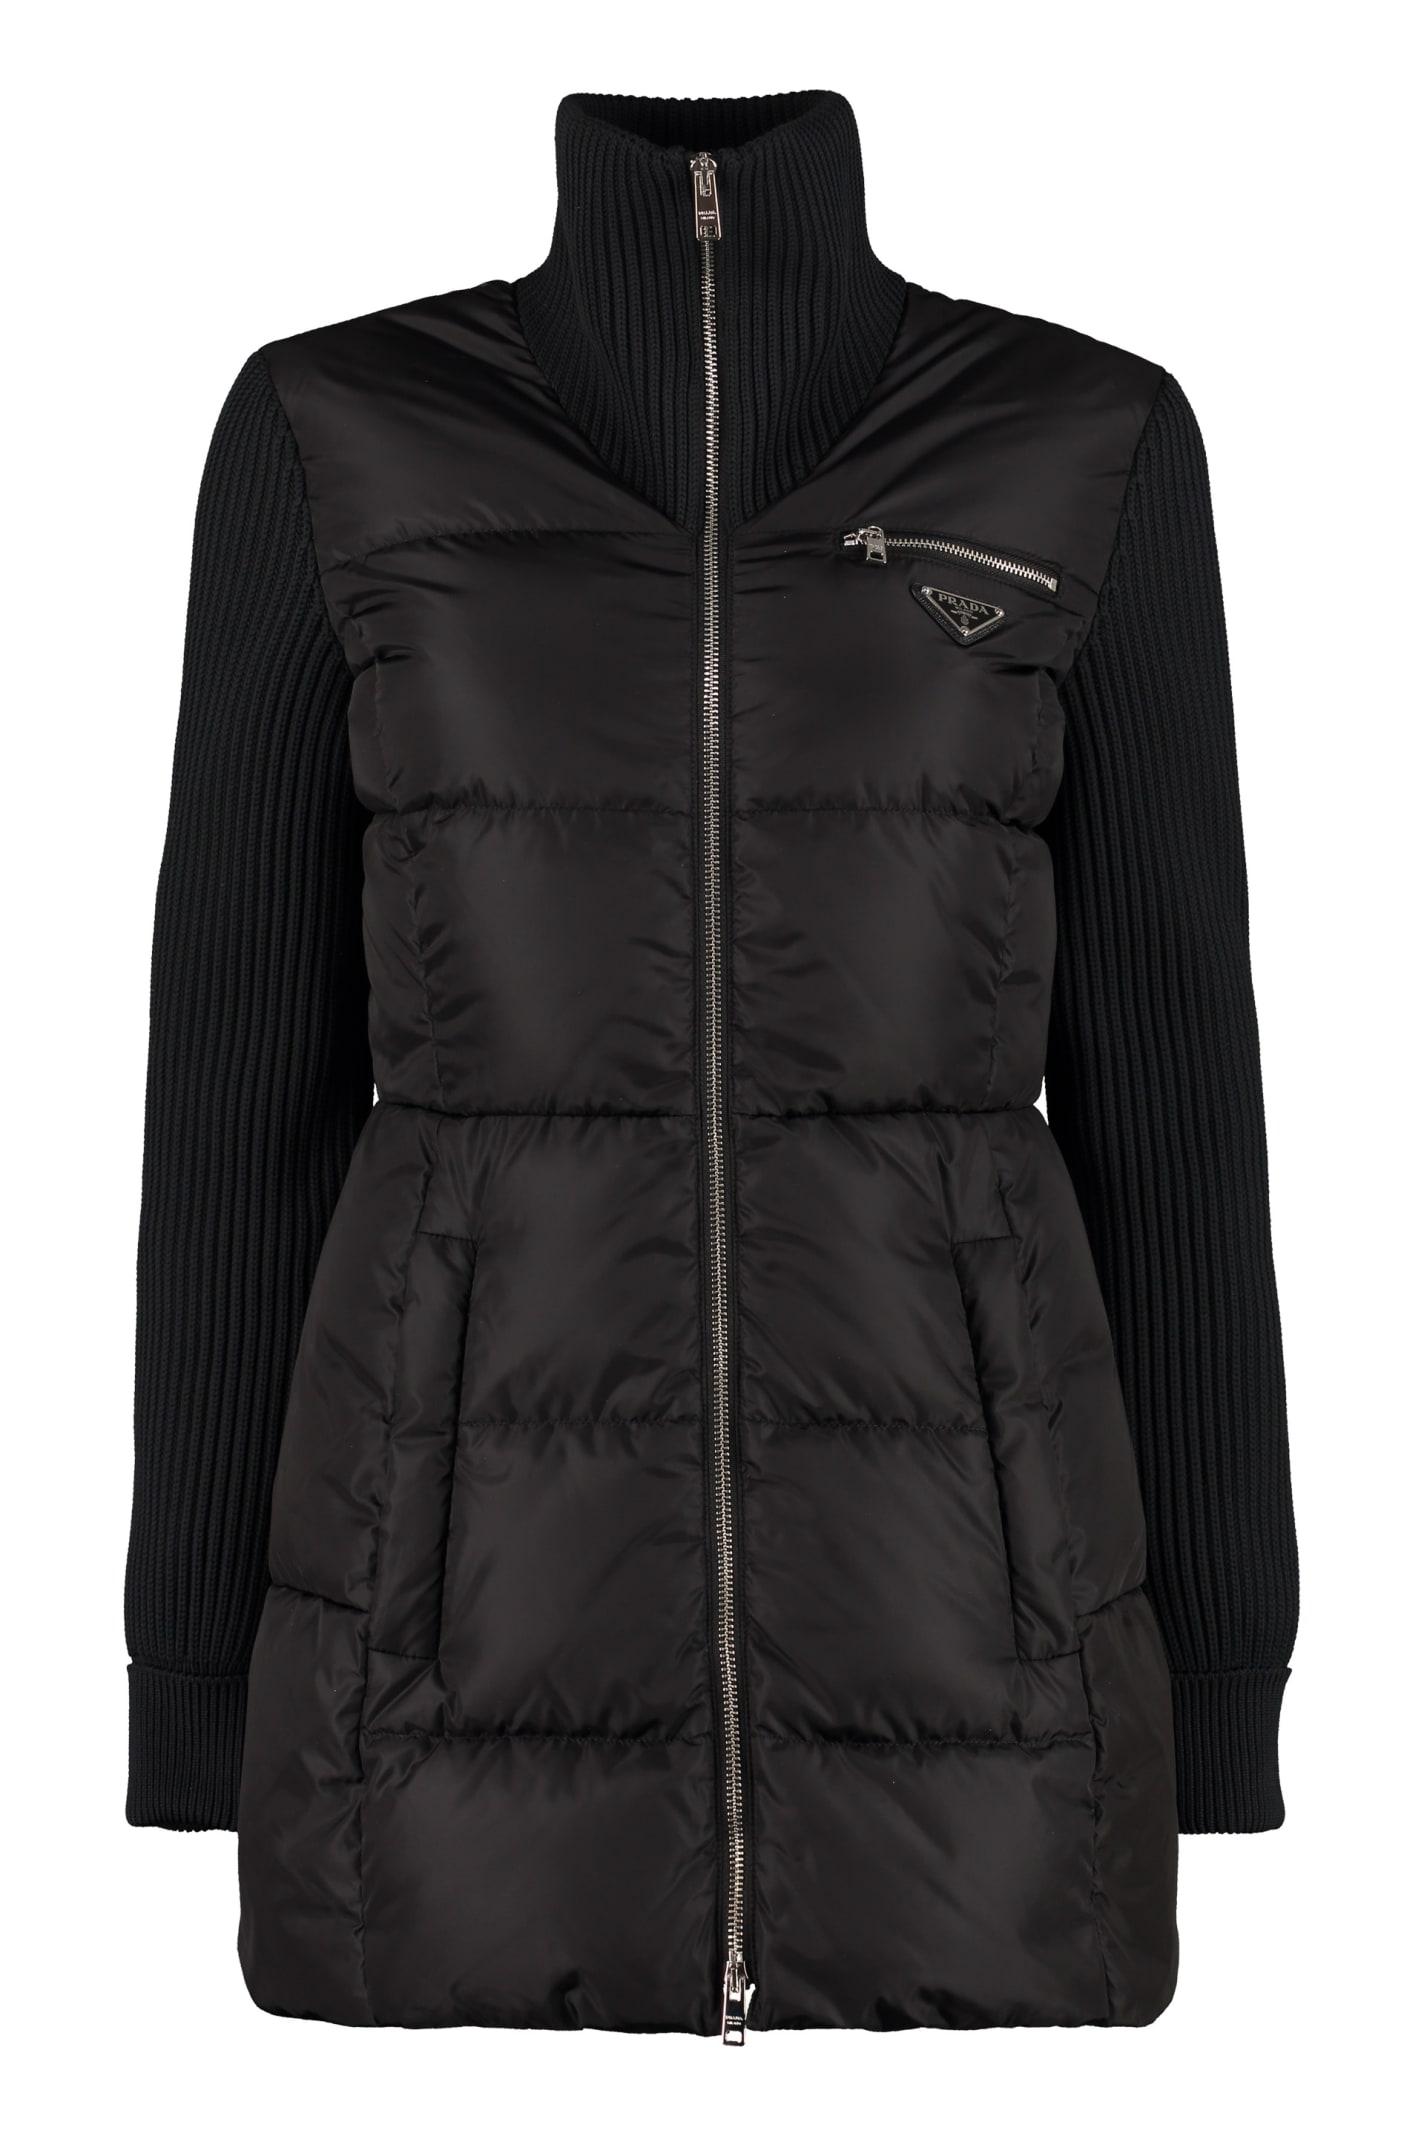 Prada Full Zip Padded Jacket With Belt